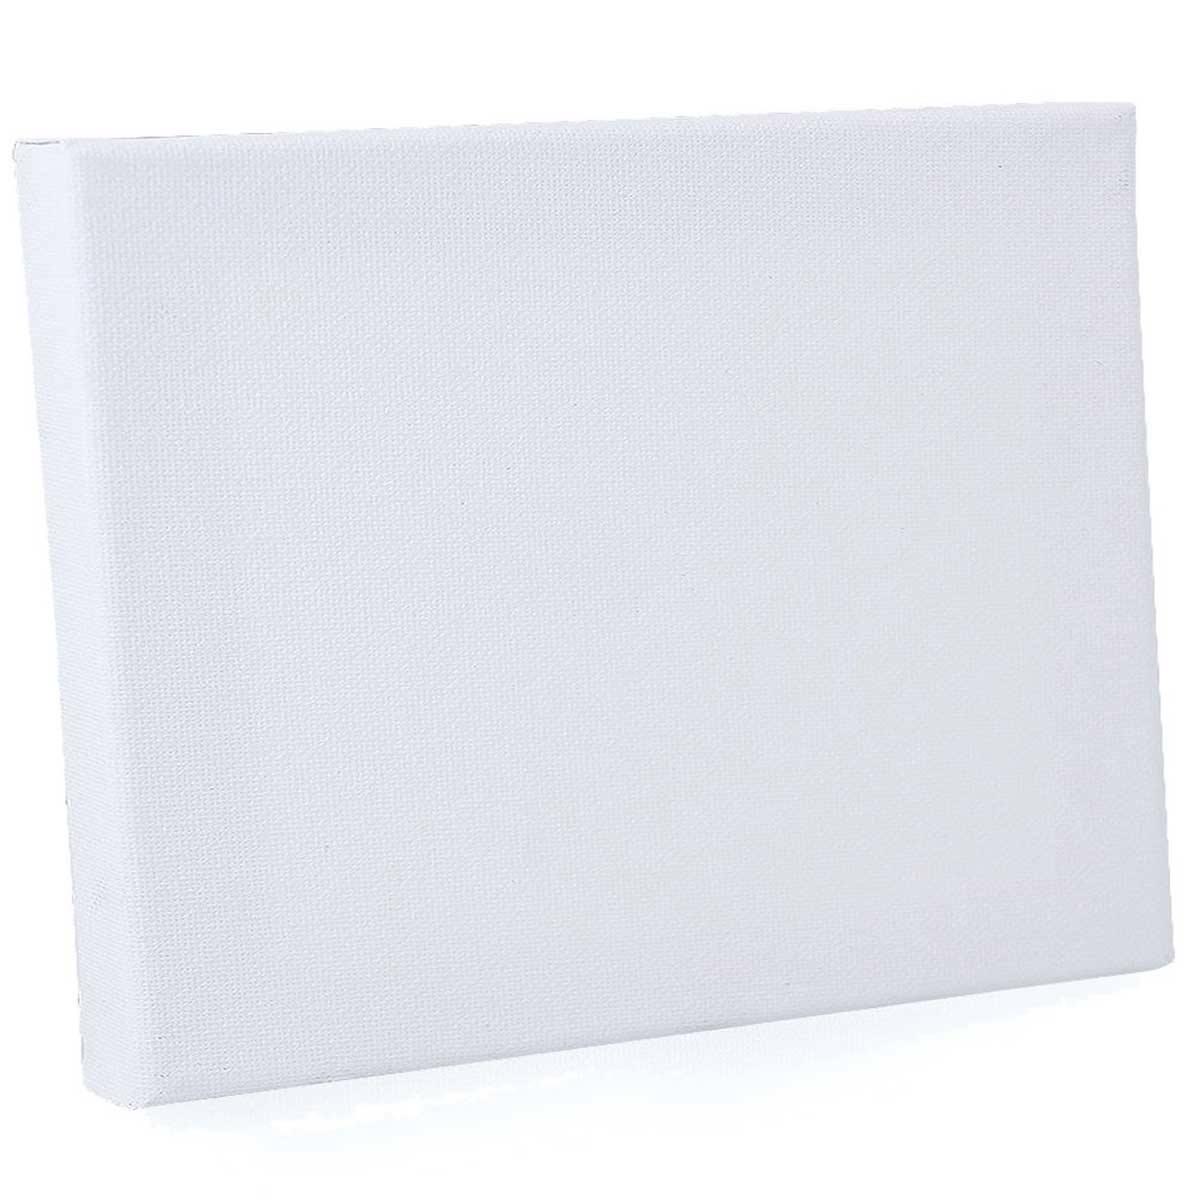 Mini Stretched Canvas Board (5X7 Inch)